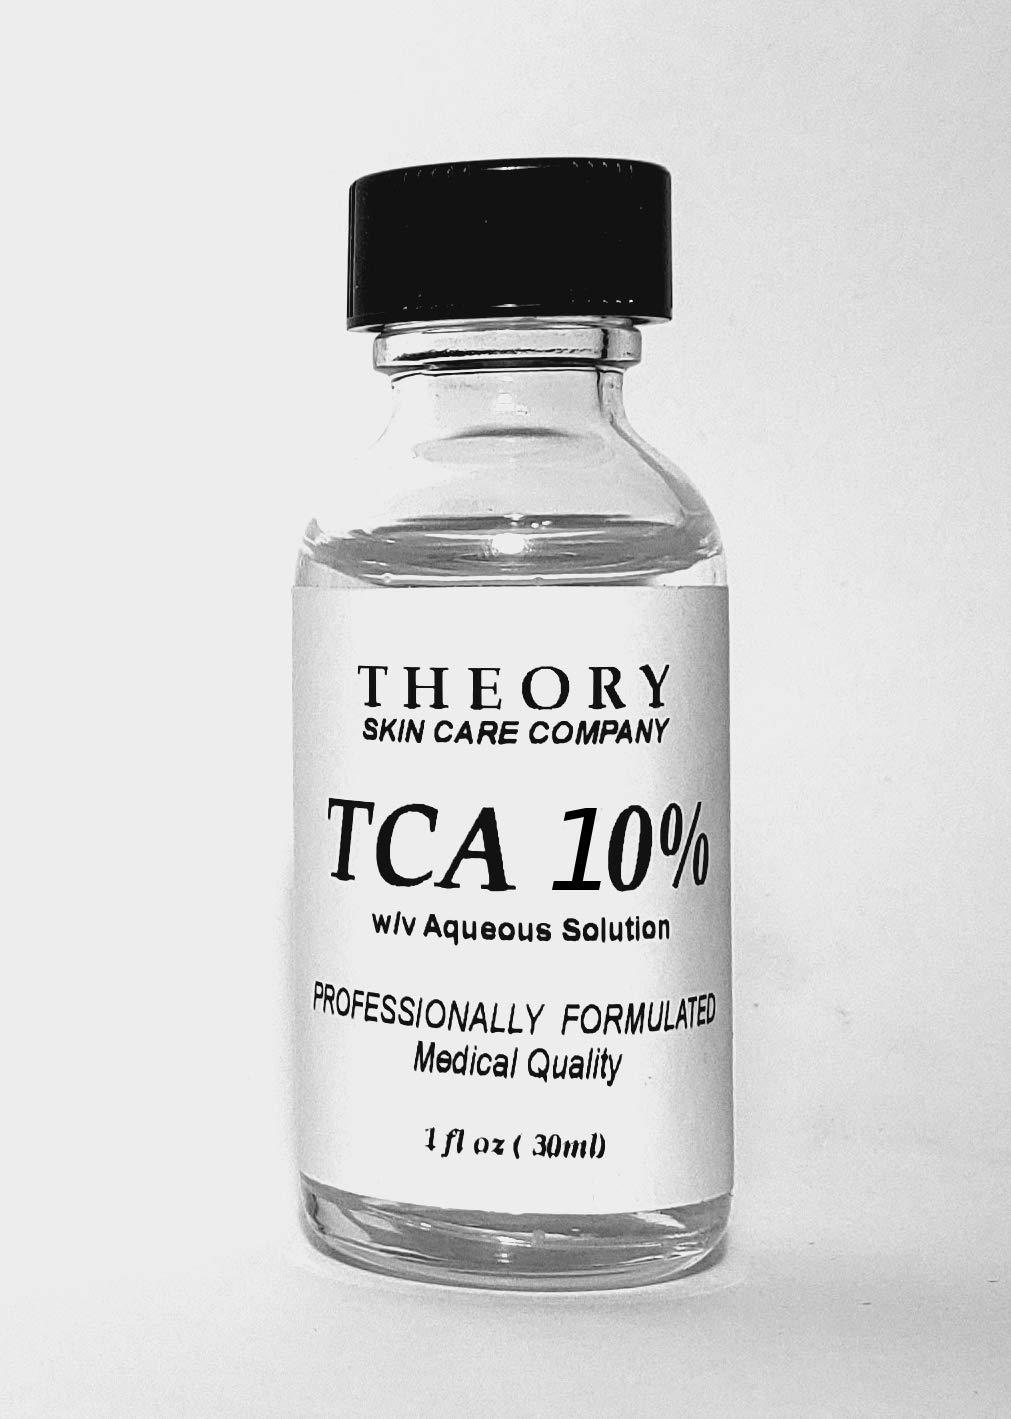 Trichloroacetic Acid 10% TCA Chemical Peel, 1 oz, Medical Grade, Wrinkles, Fine Lines, Freckles, Scars, Age spots